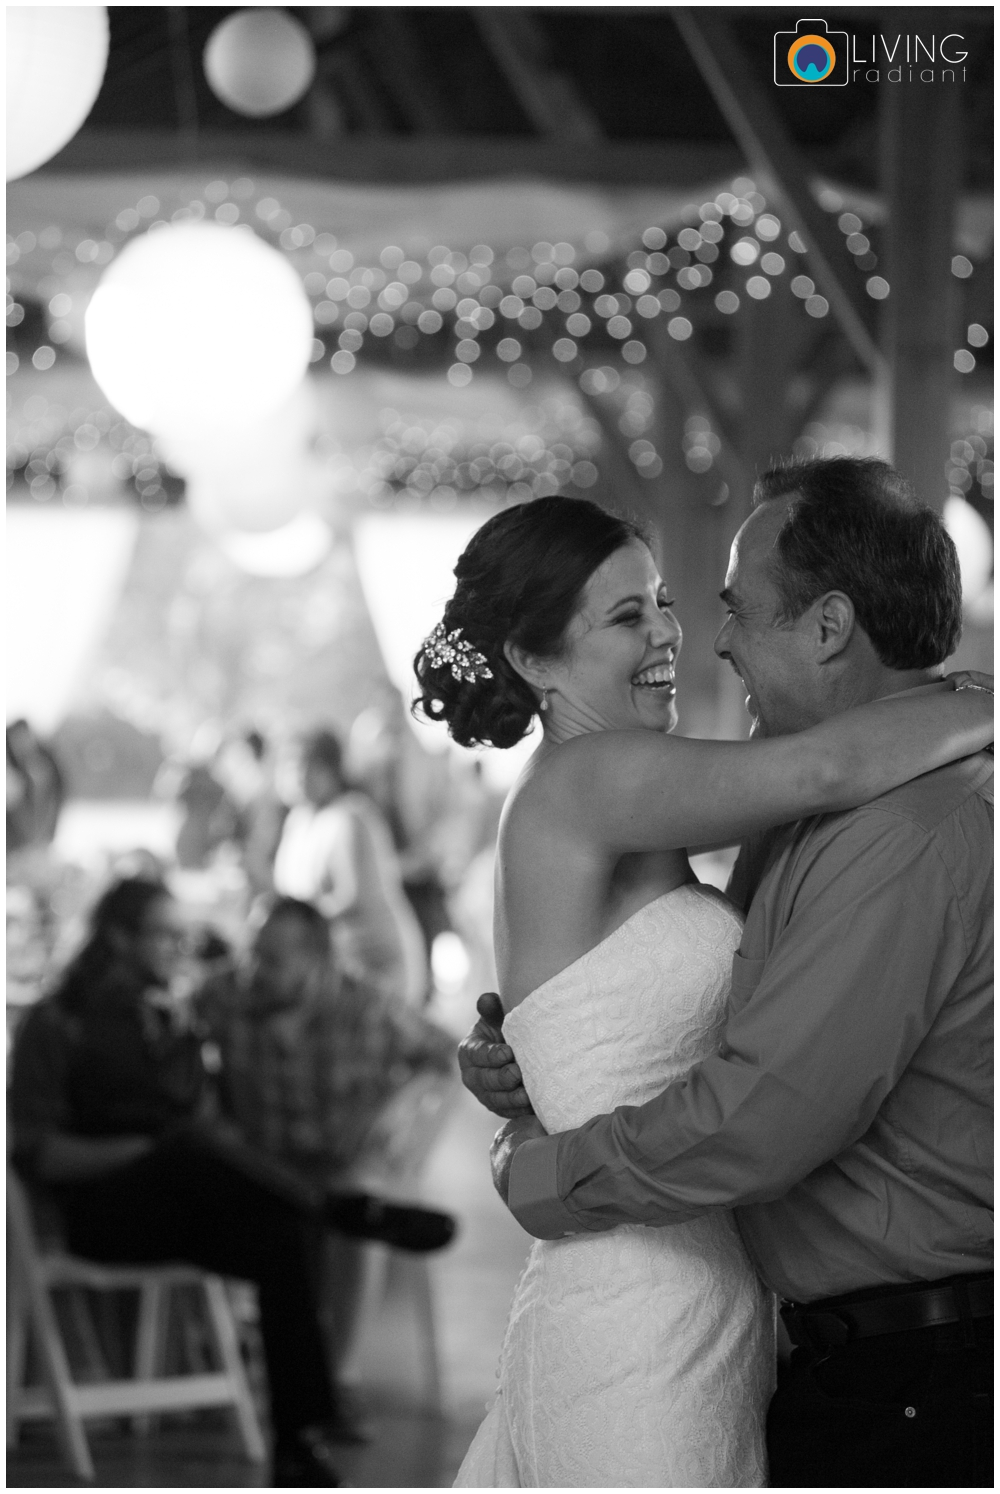 shannon-bill-bowers-wedding-living-radiant-photography-union-mills-homestead_0032.jpg